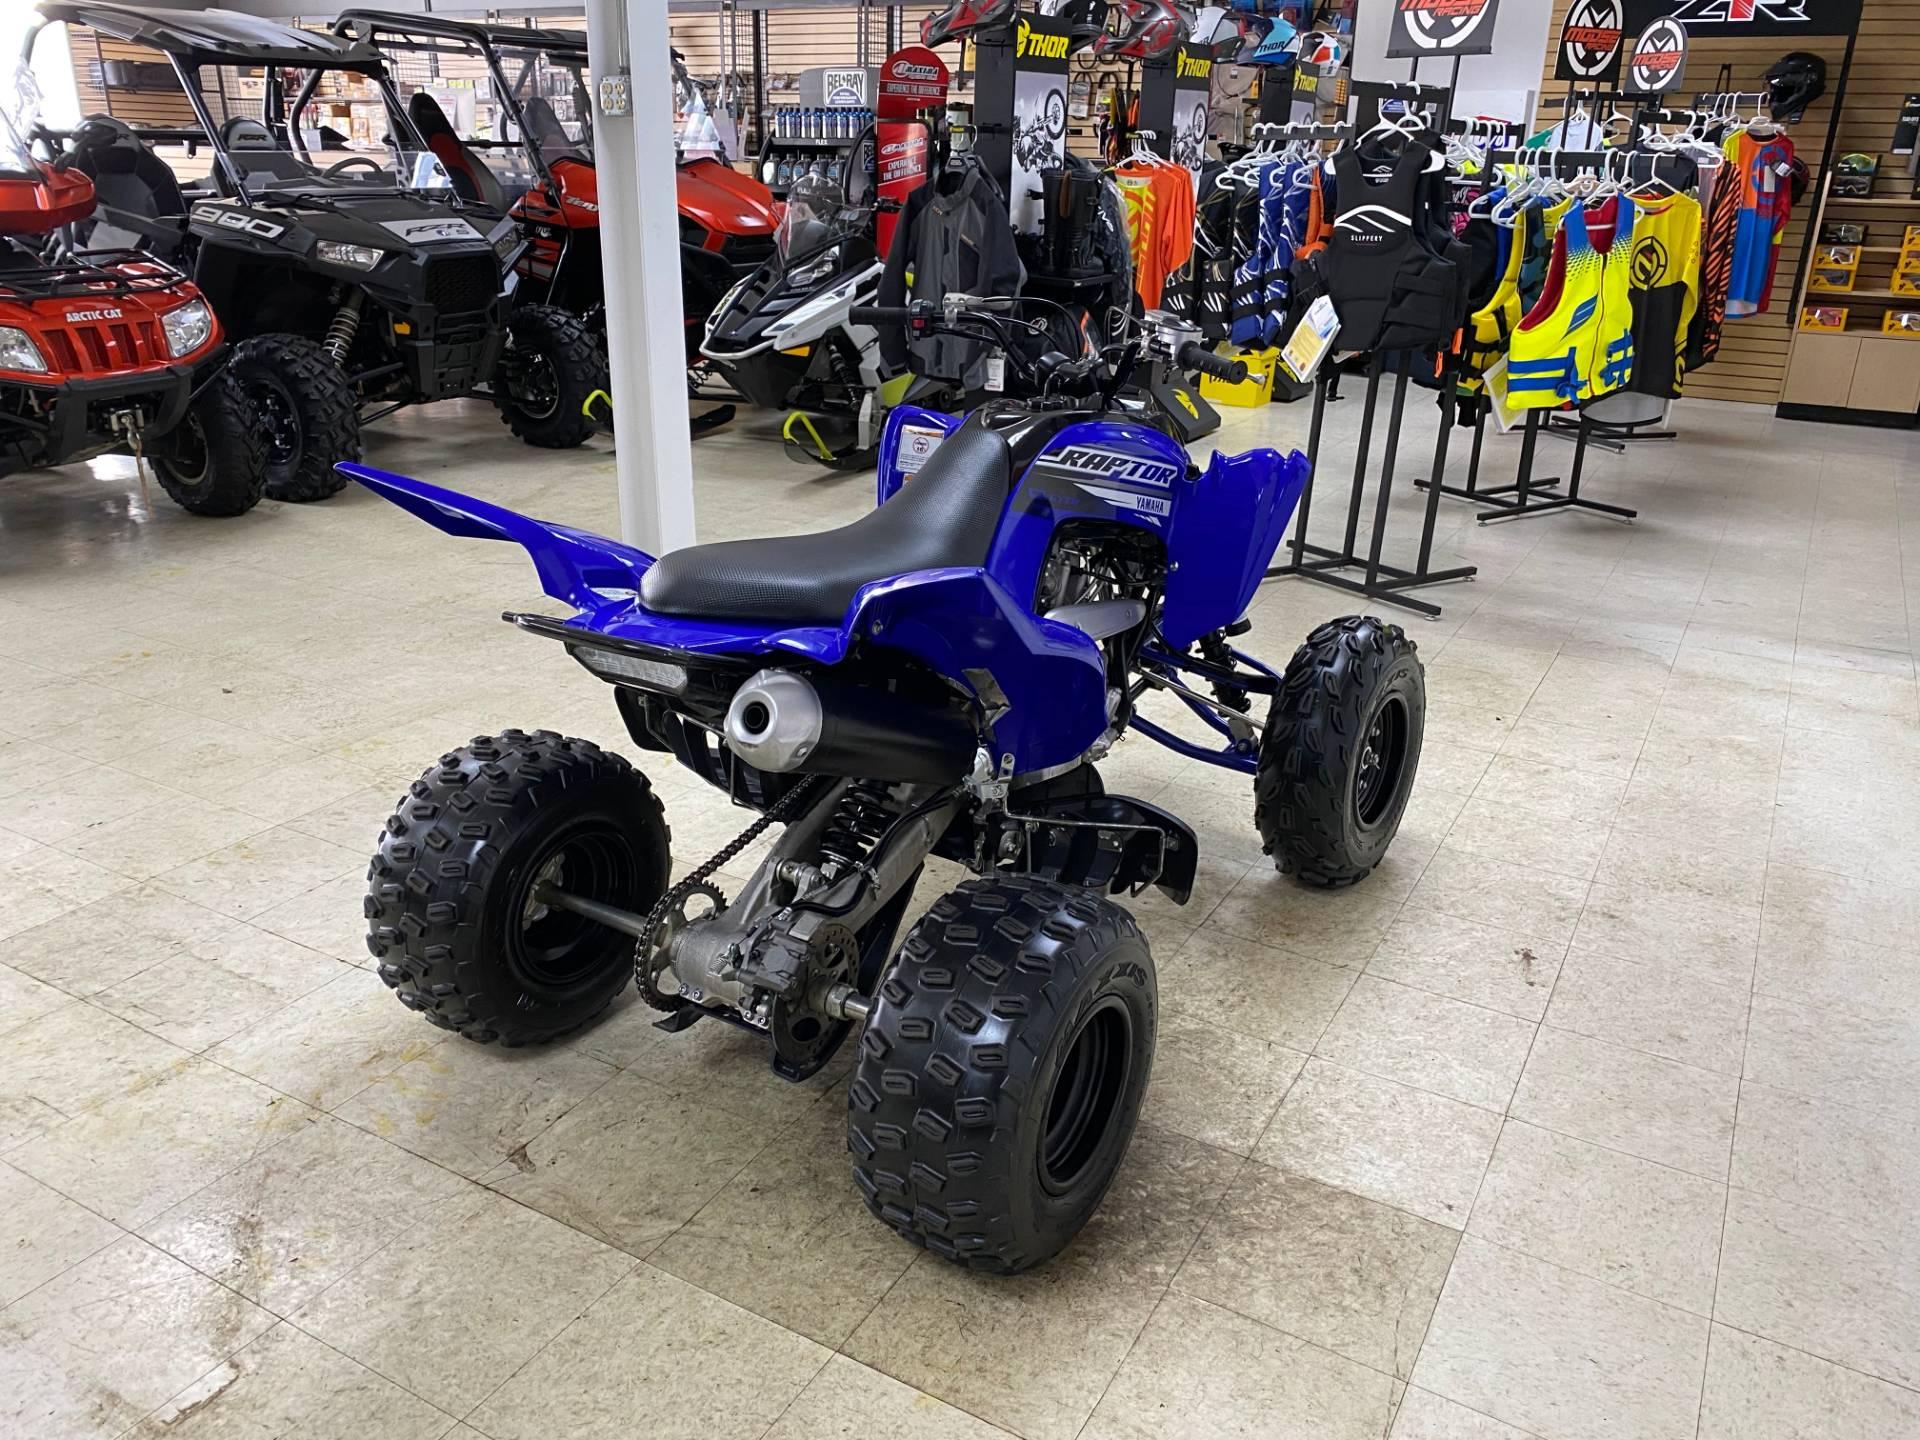 2019 Yamaha Raptor 700R 10